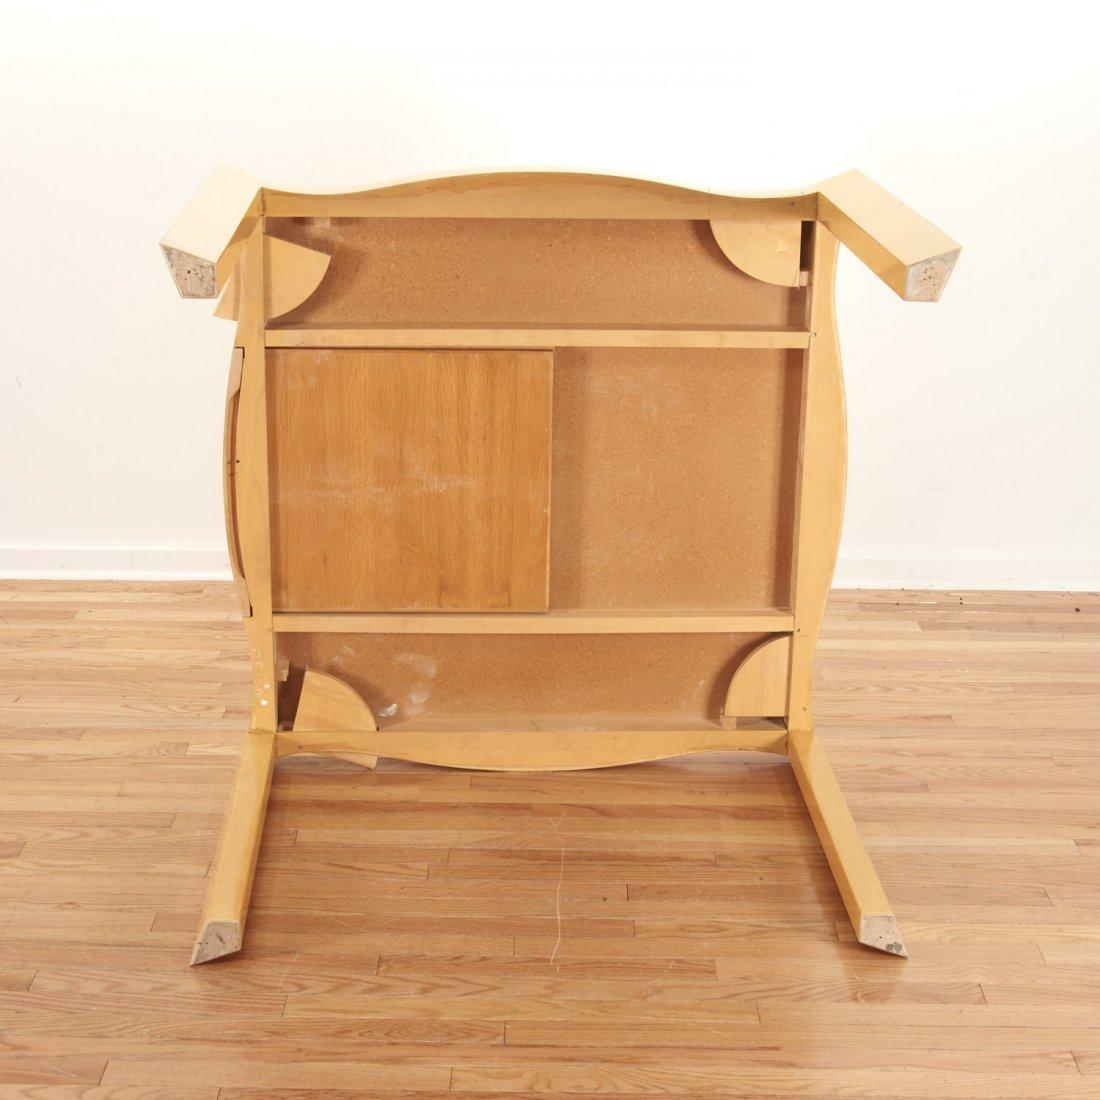 Designer shaped blonde wood bridge table - 7